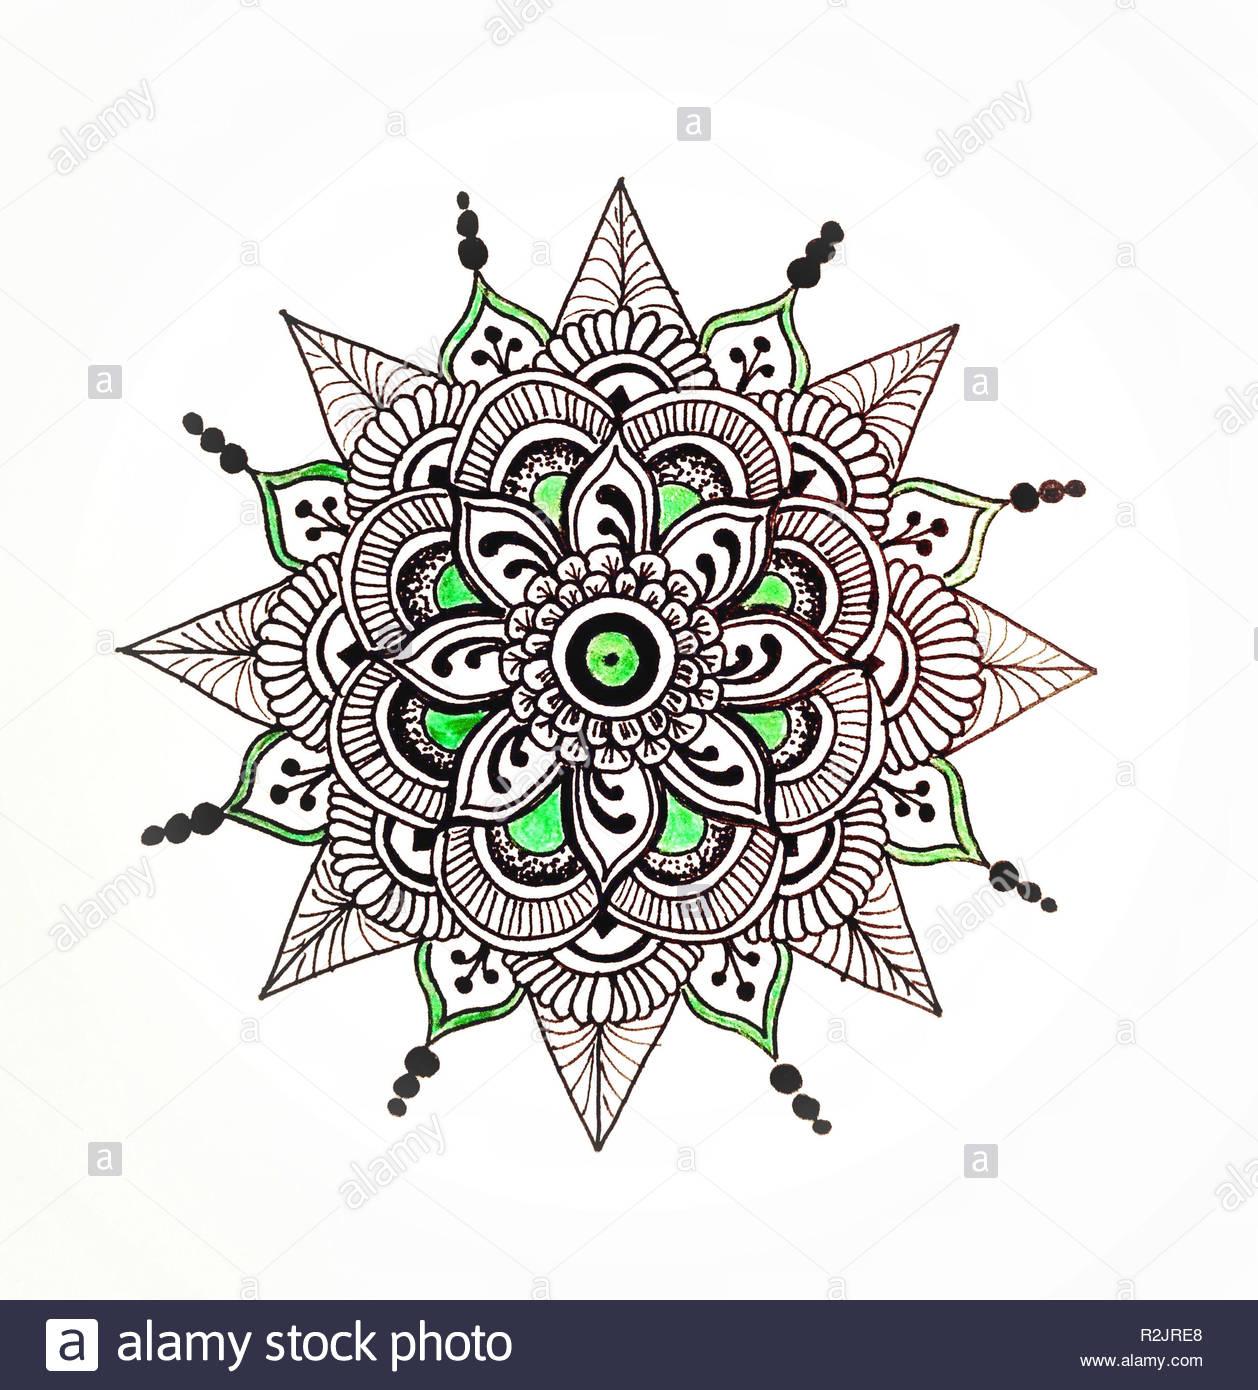 Bricolage, Dessin, Mandala Banque D'images, Photo Stock tout Dessiner Un Mandala